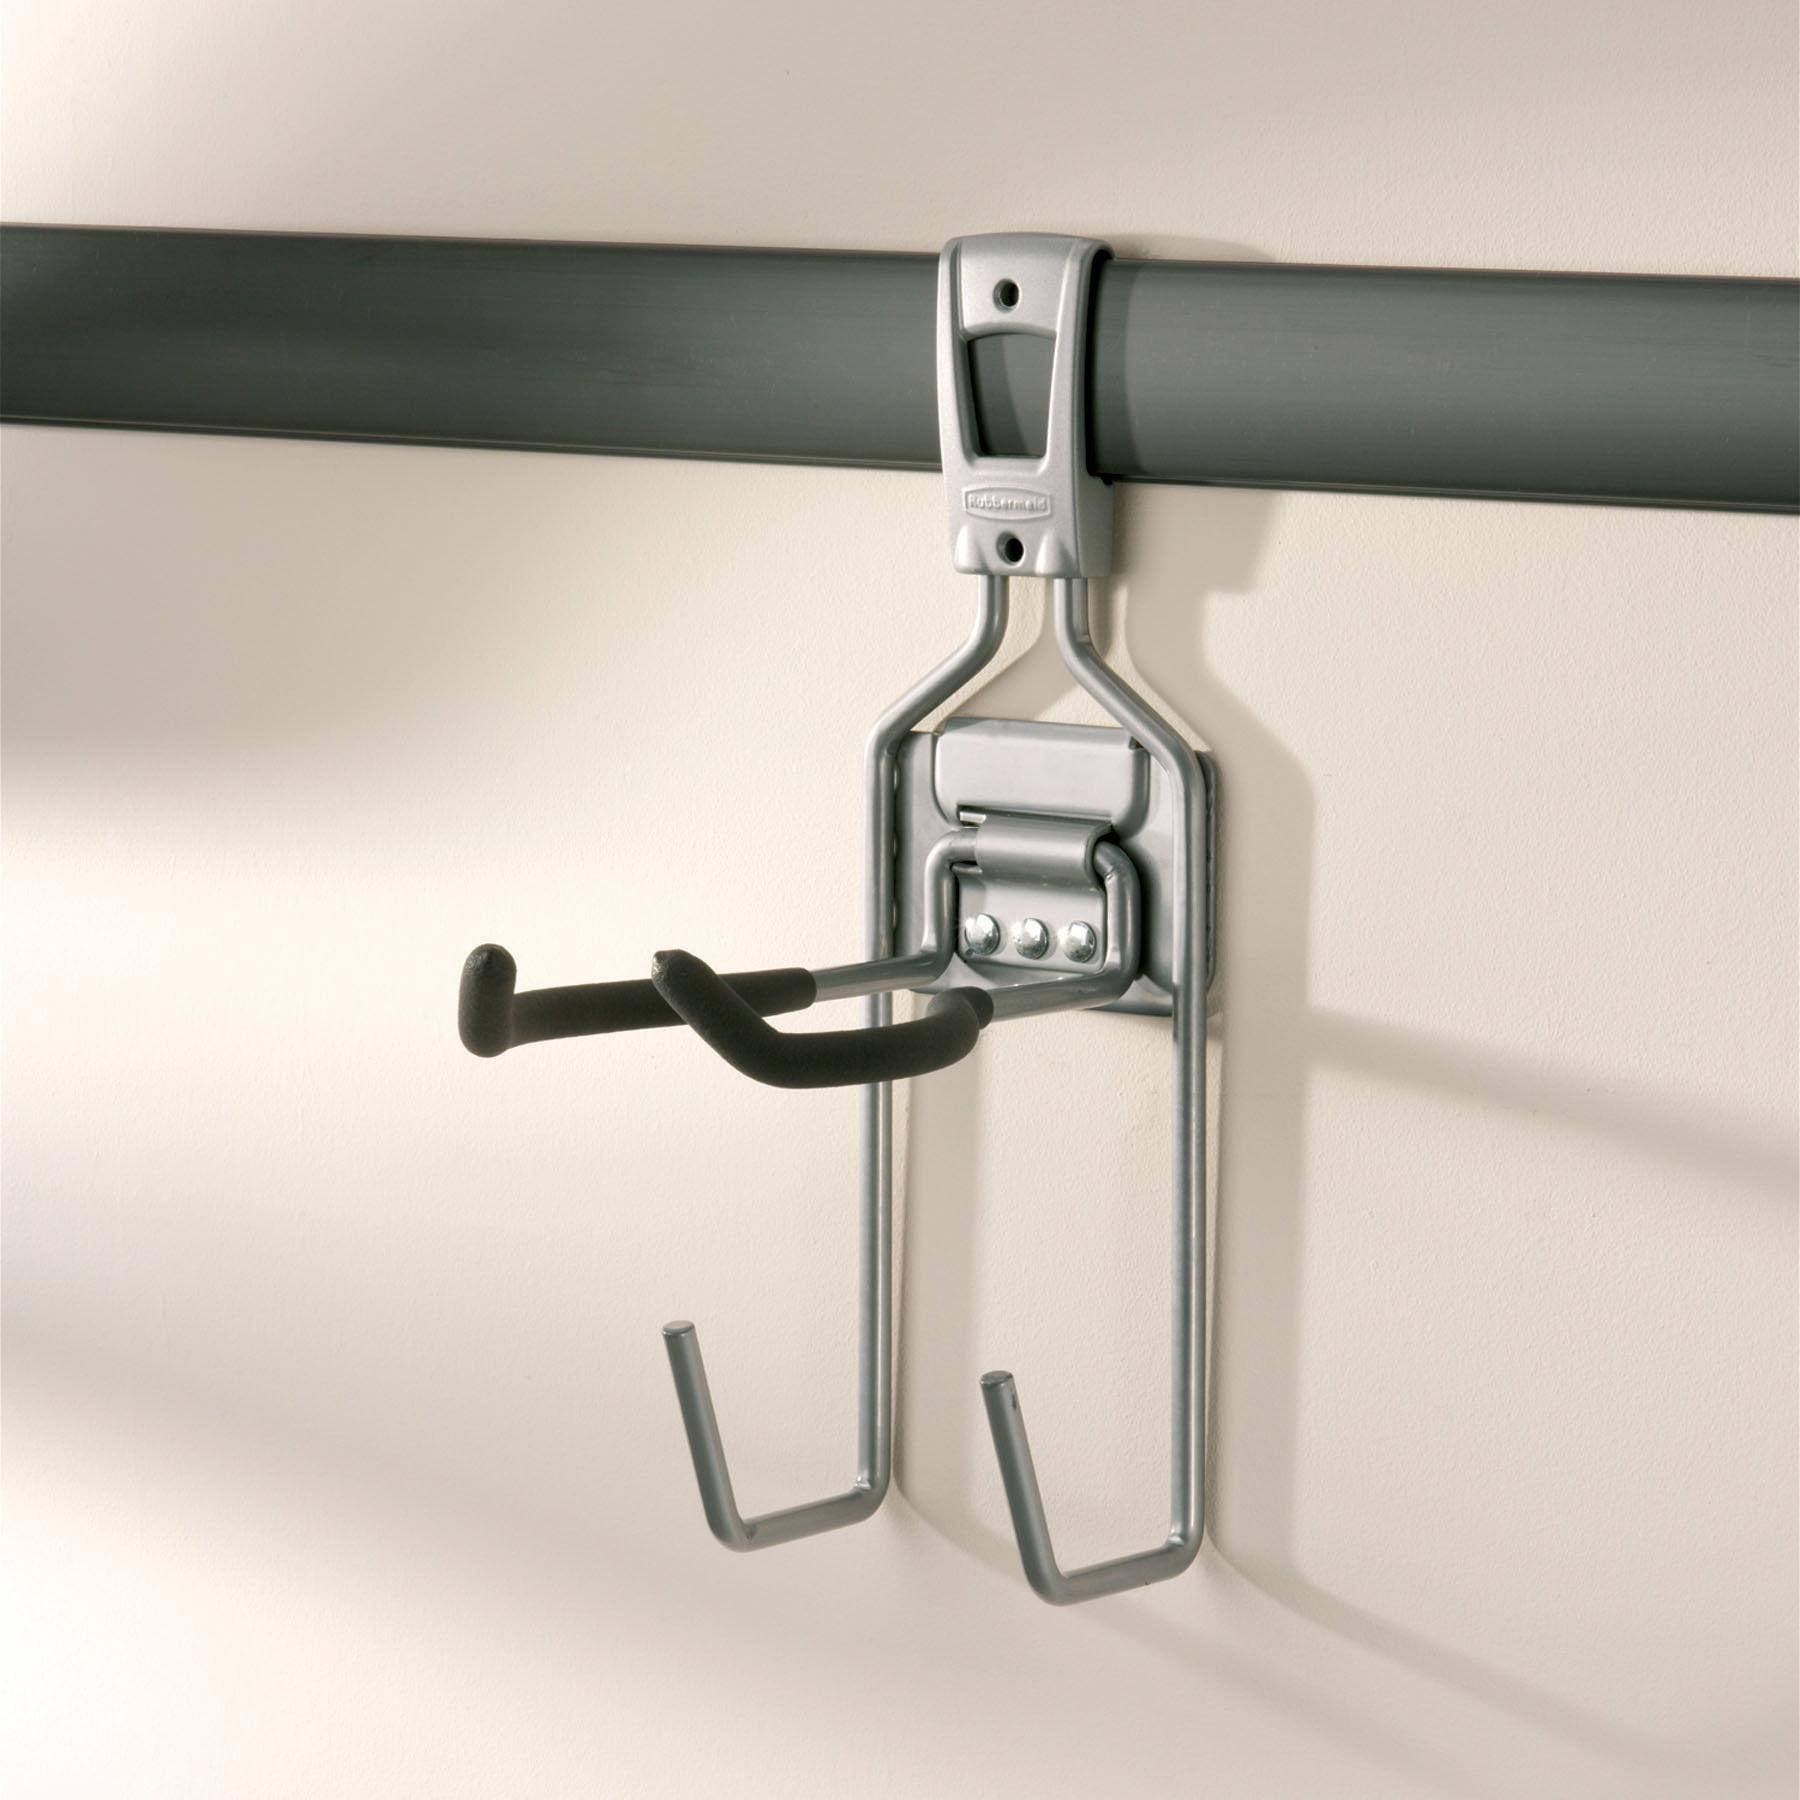 Ecklers Premier Quality Products 33376469 Ricks Camaro Parking Brake Lever Kit Right